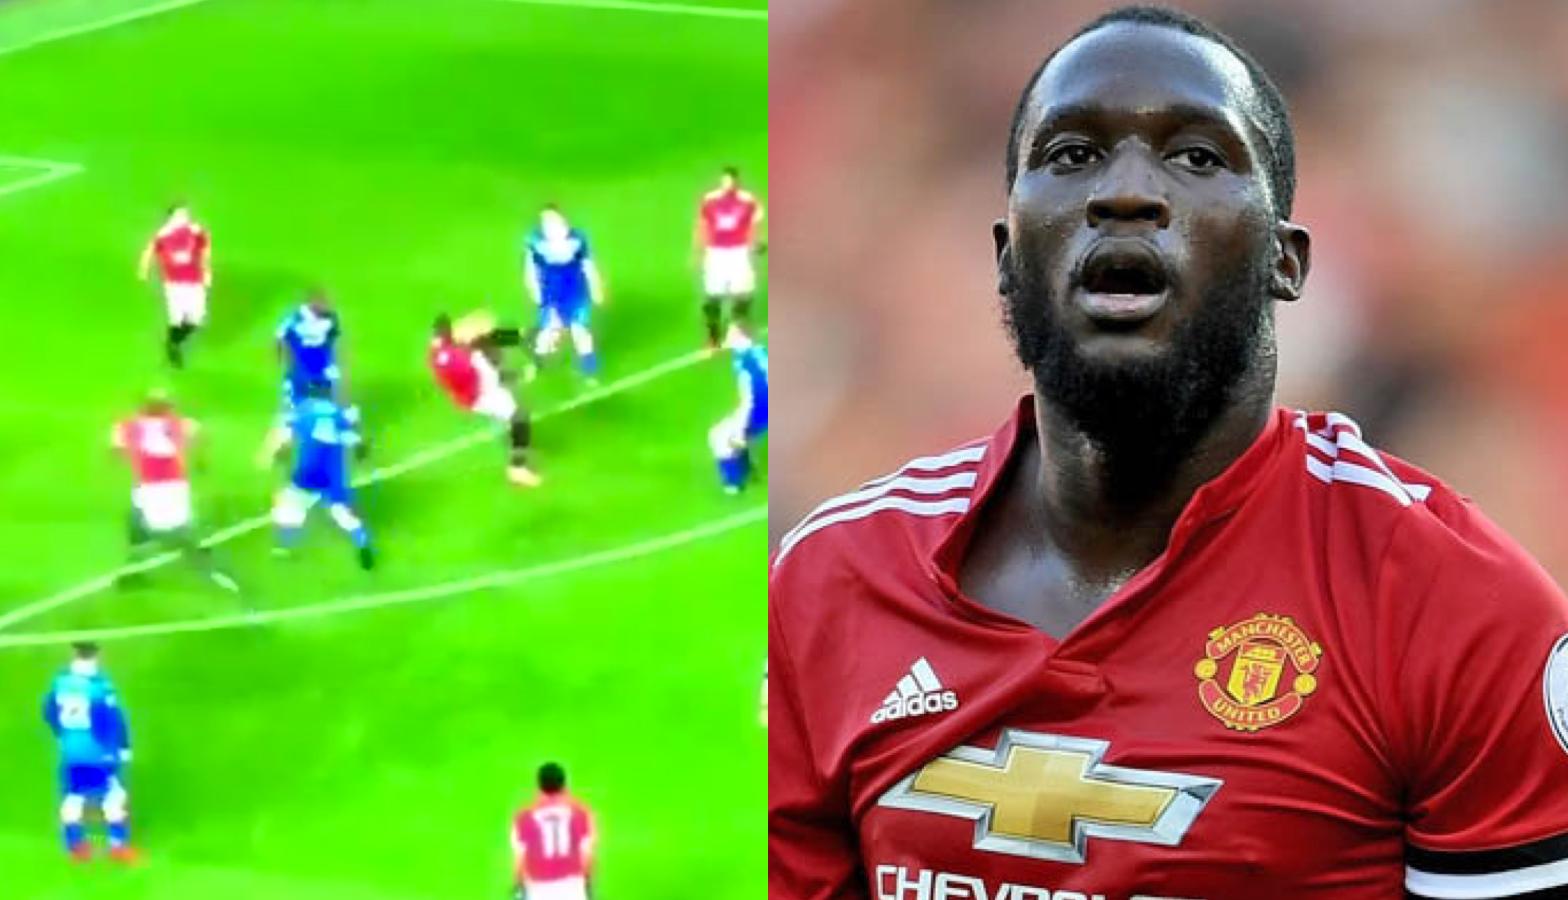 WATCH: Romelu Lukaku Smashes Football Into His Own Face